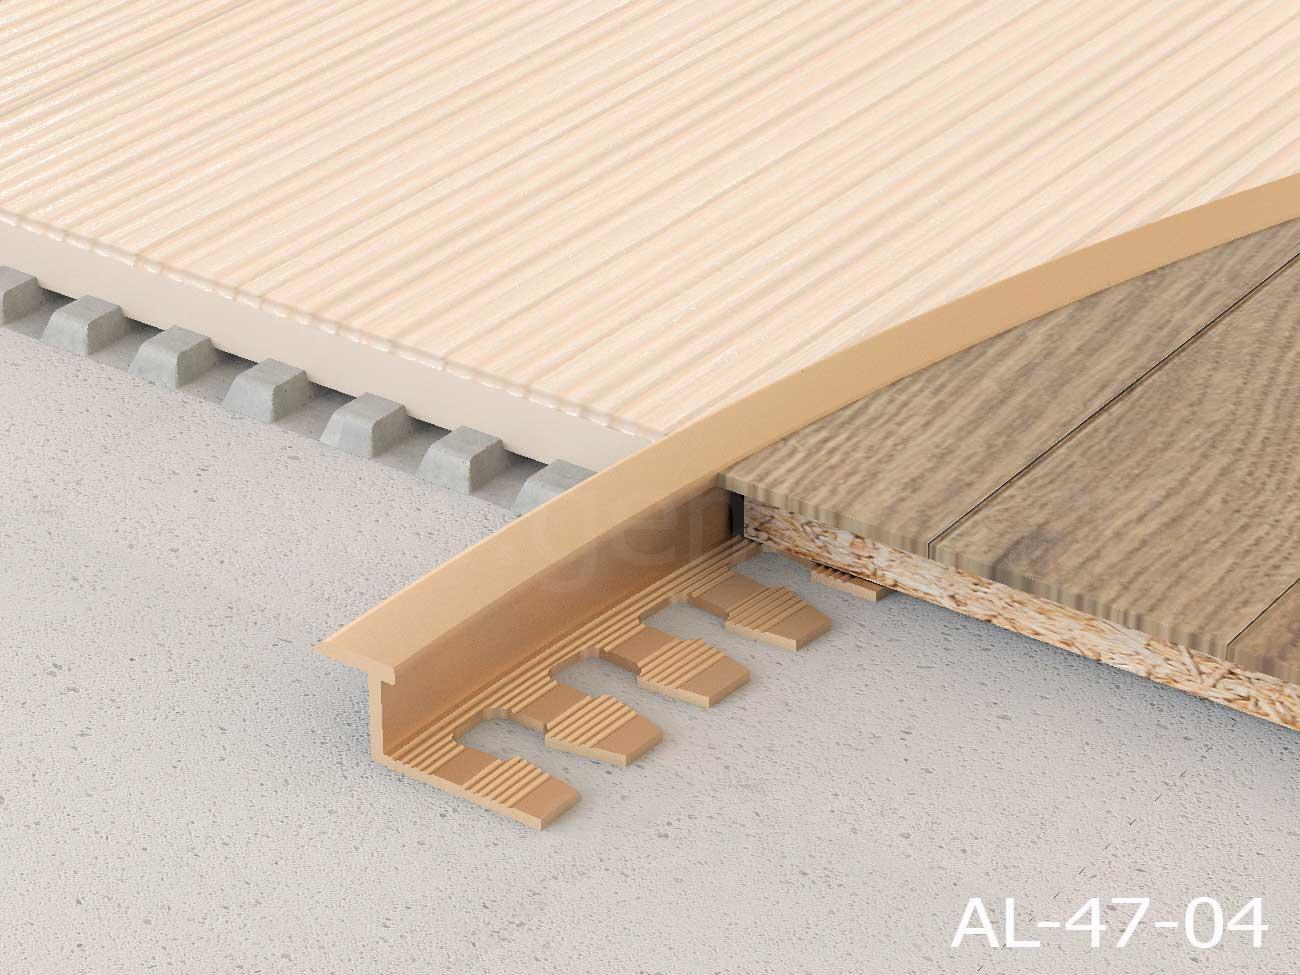 Z-профиль гибкий алюминиевый Butun AL-47-04